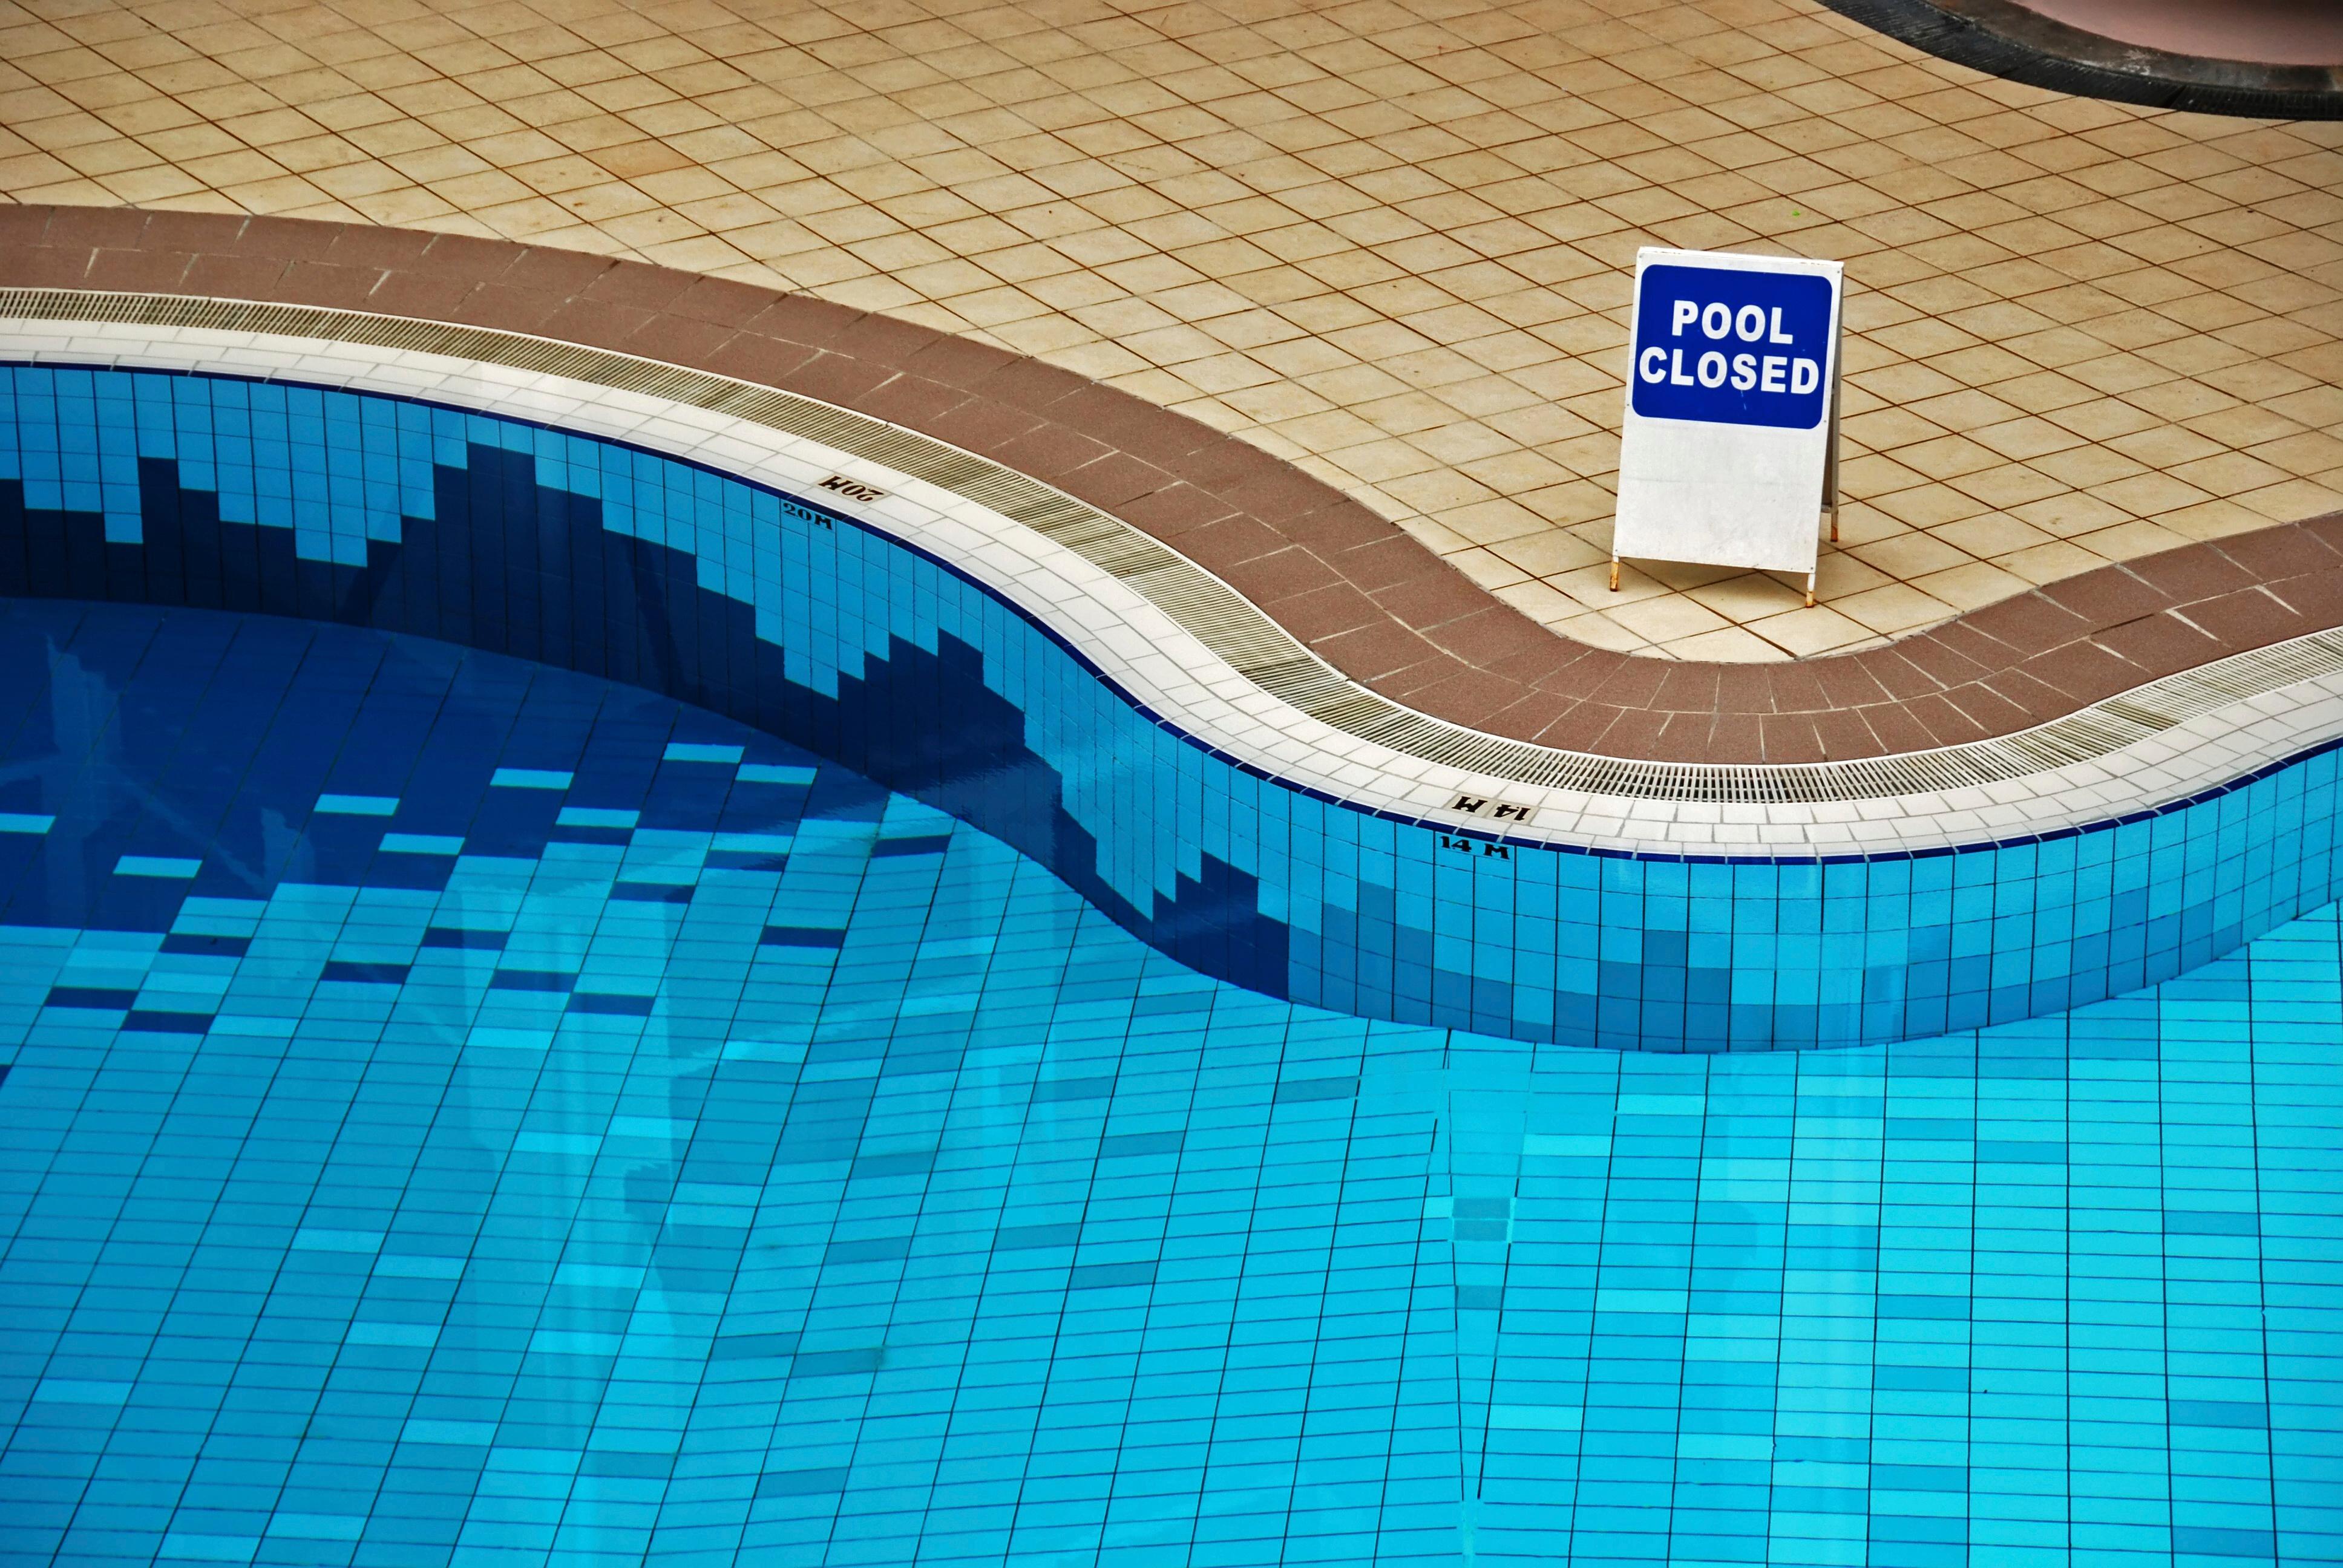 Pool_Shutdowns_main_image_part_1